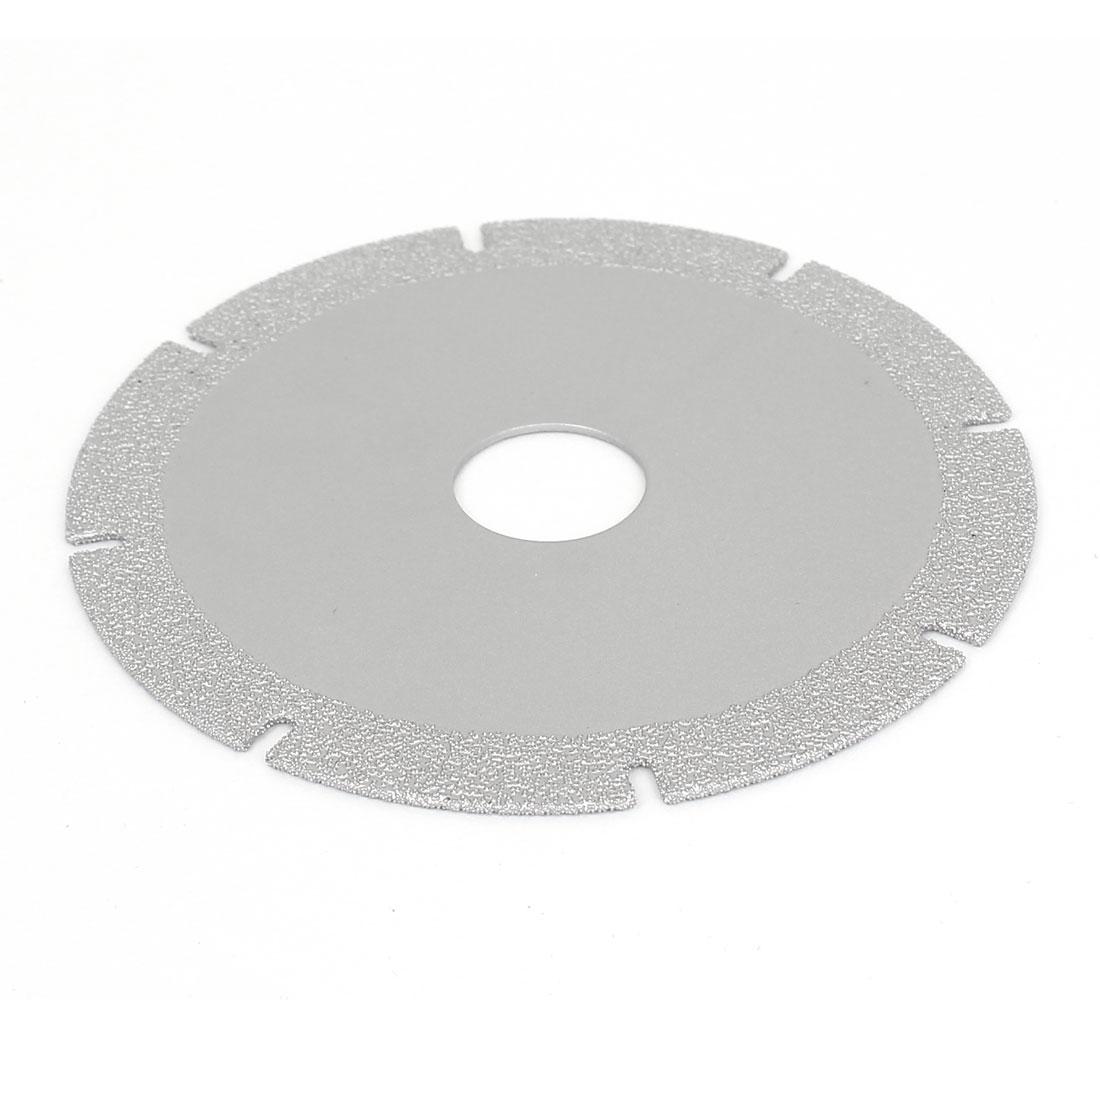 Marble Ceramic 100mm Outer Dia 20mm Bore Diamond Cut Off Disc Saw Cutter Wheel